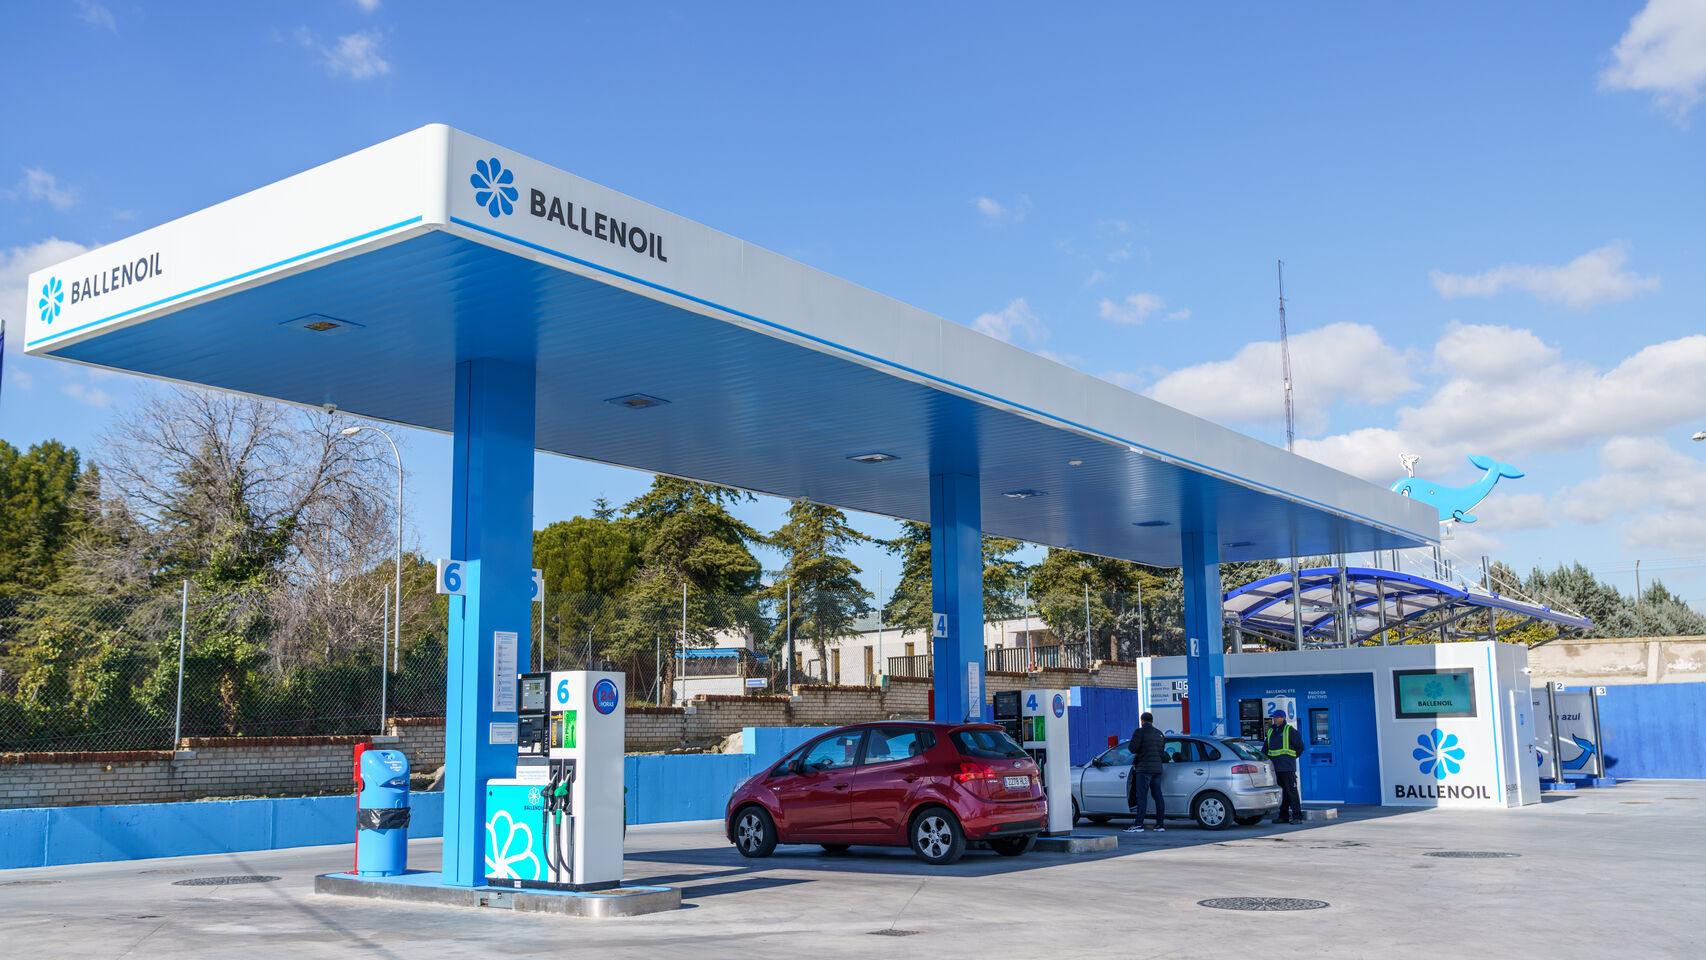 Ballenoil gasolinera